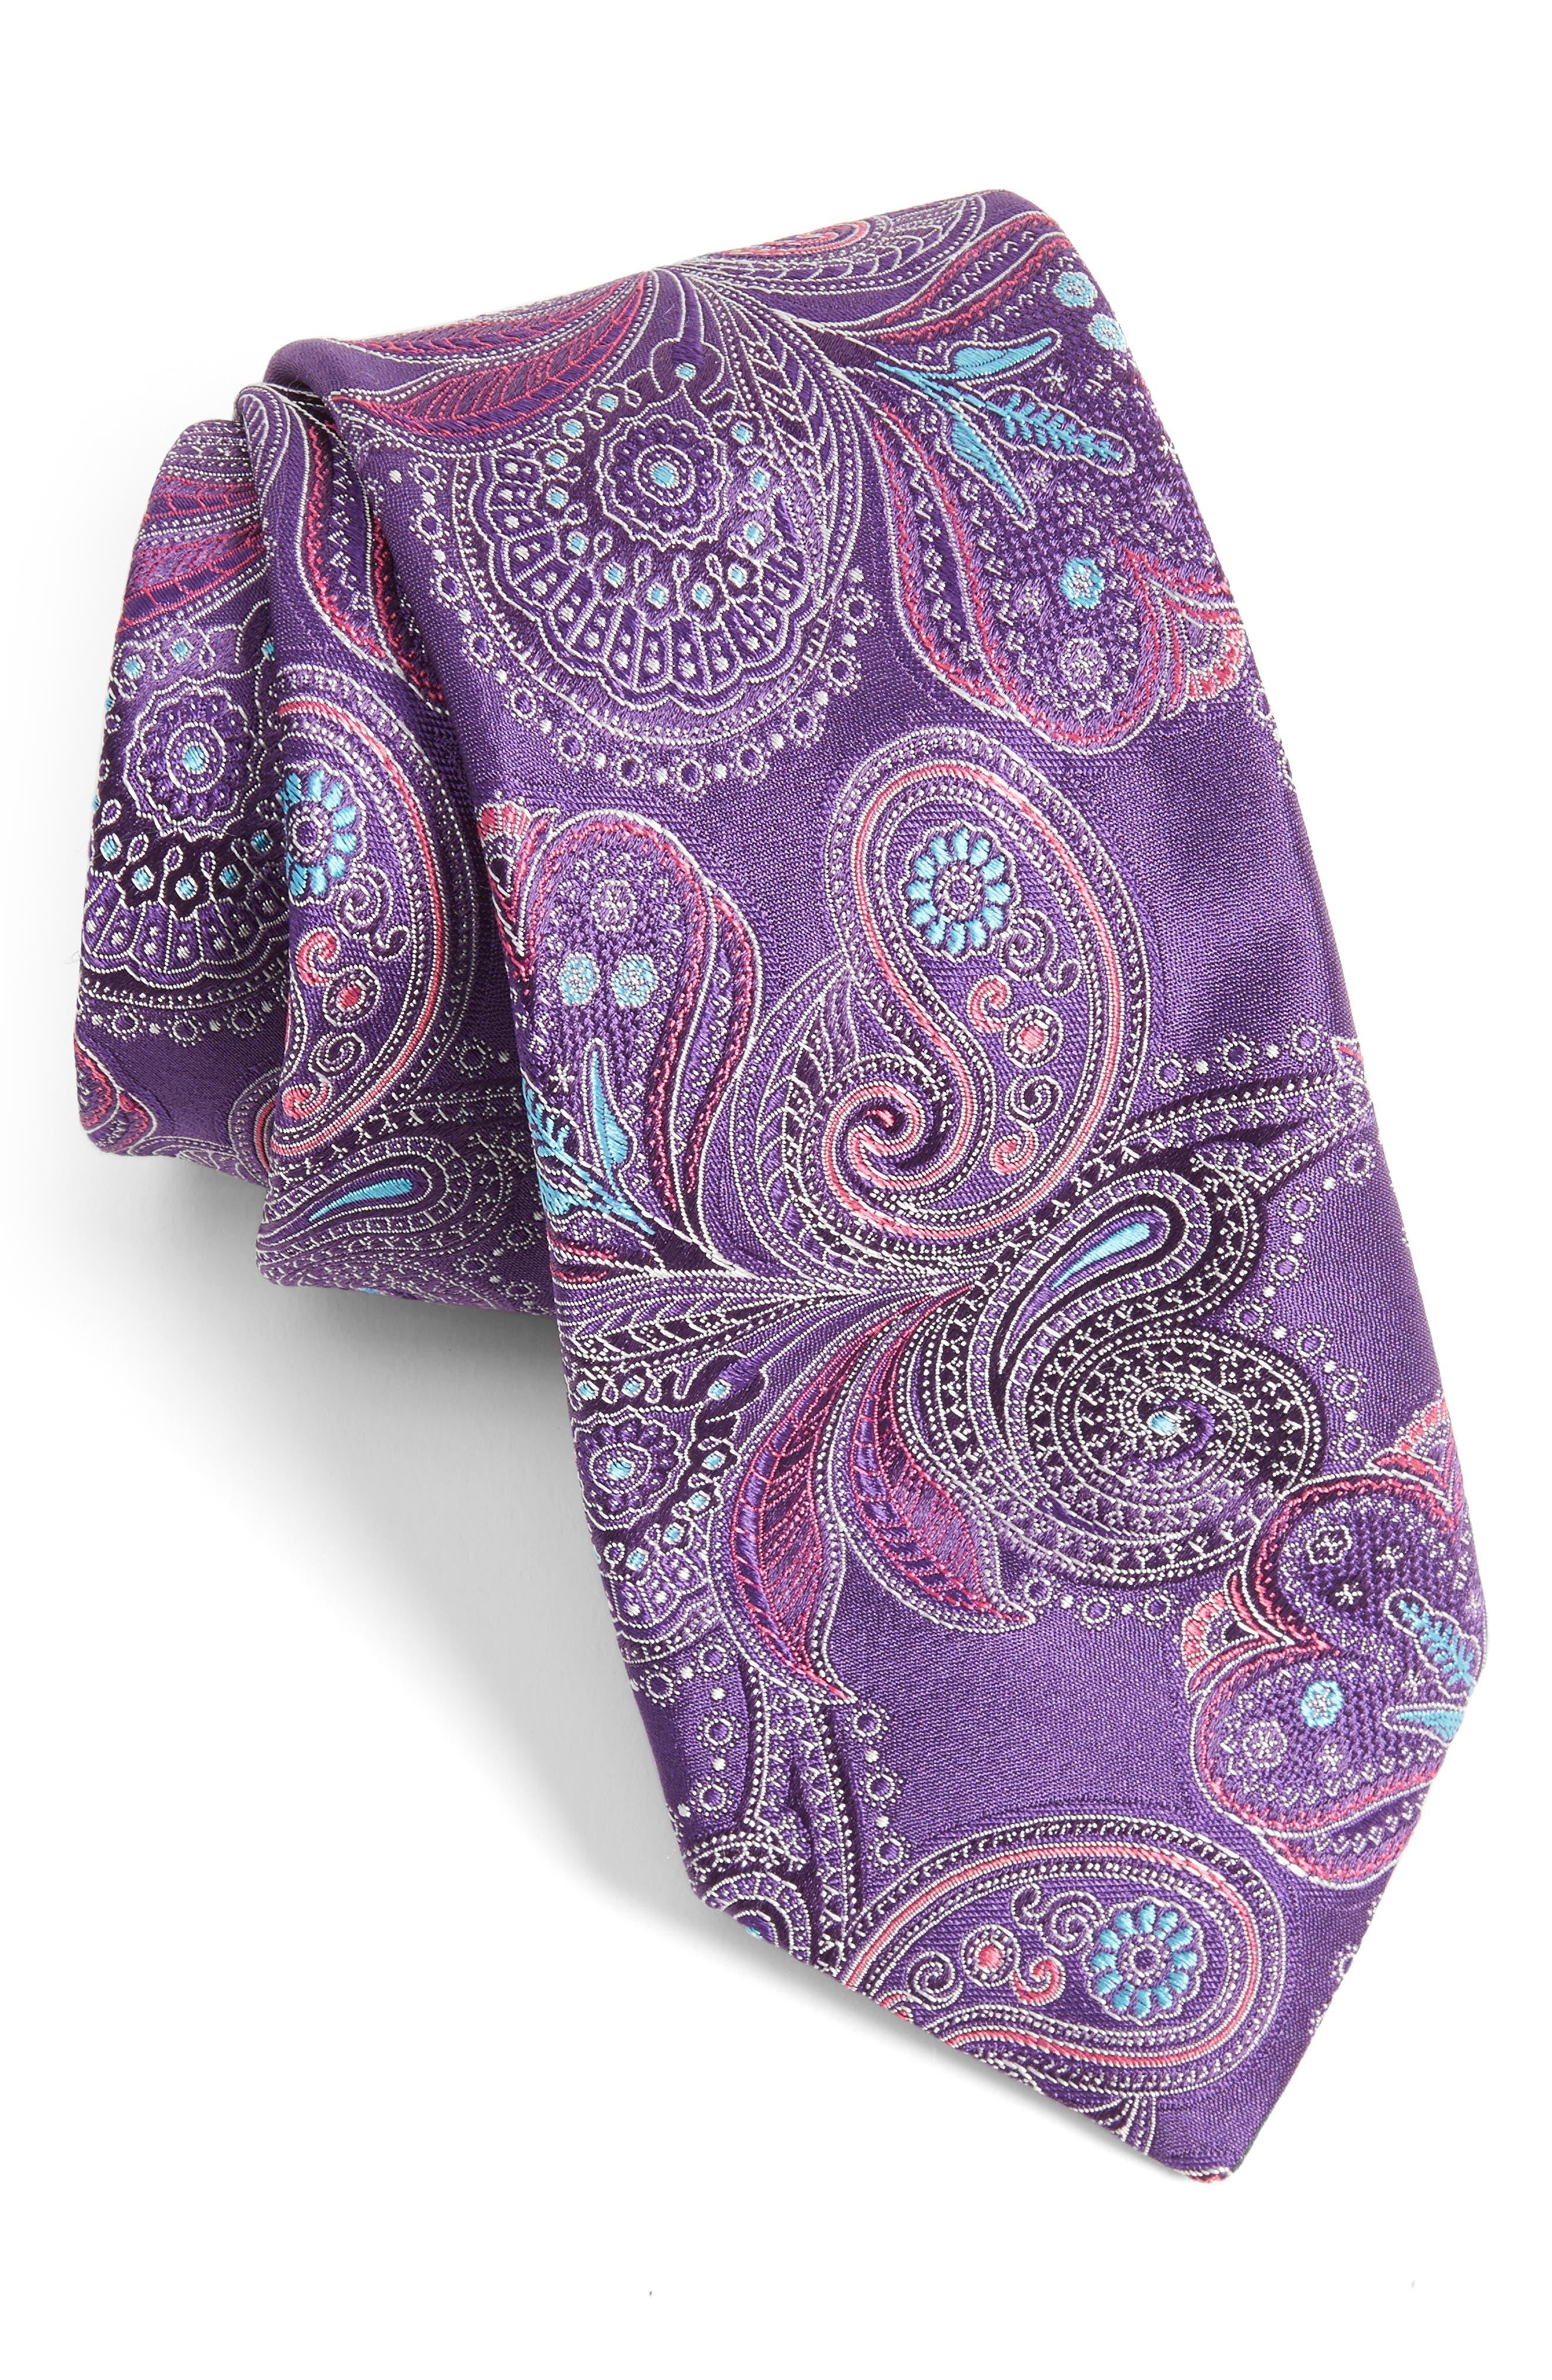 Main Image - Ted Baker London Paisley Silk Tie